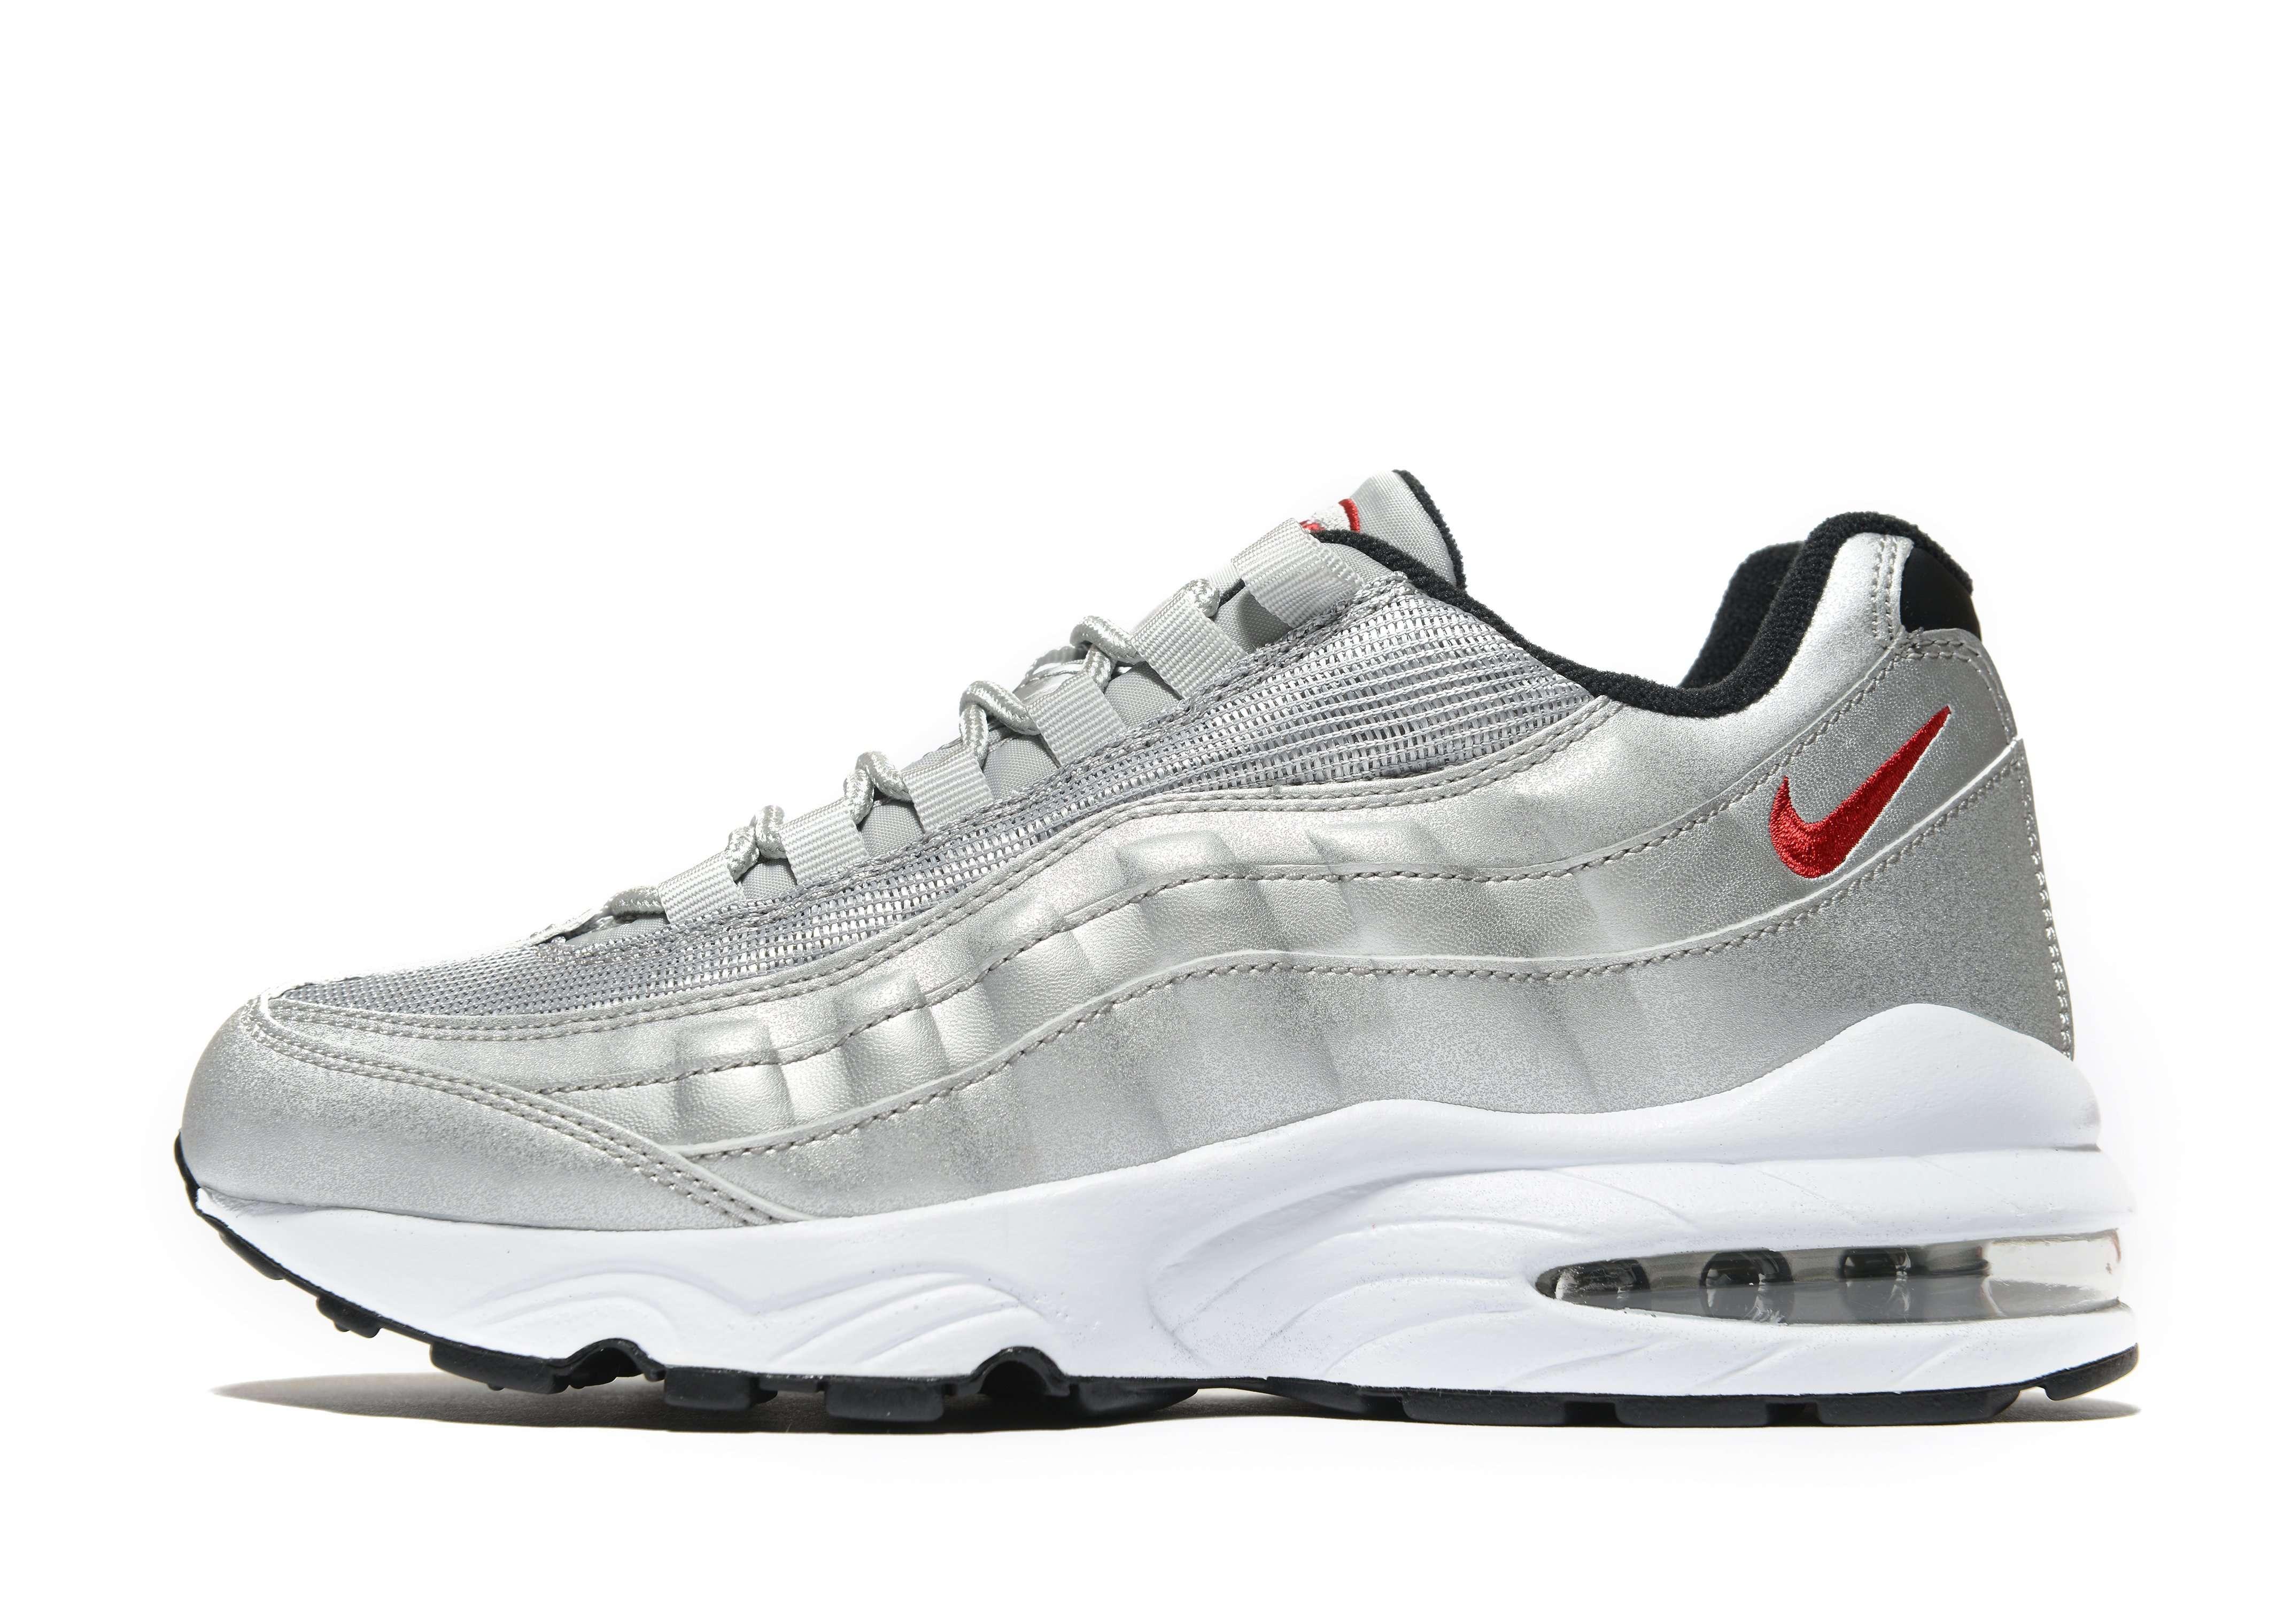 taille 40 25ab2 499b8 Nike Air Max 95 Jd Sports